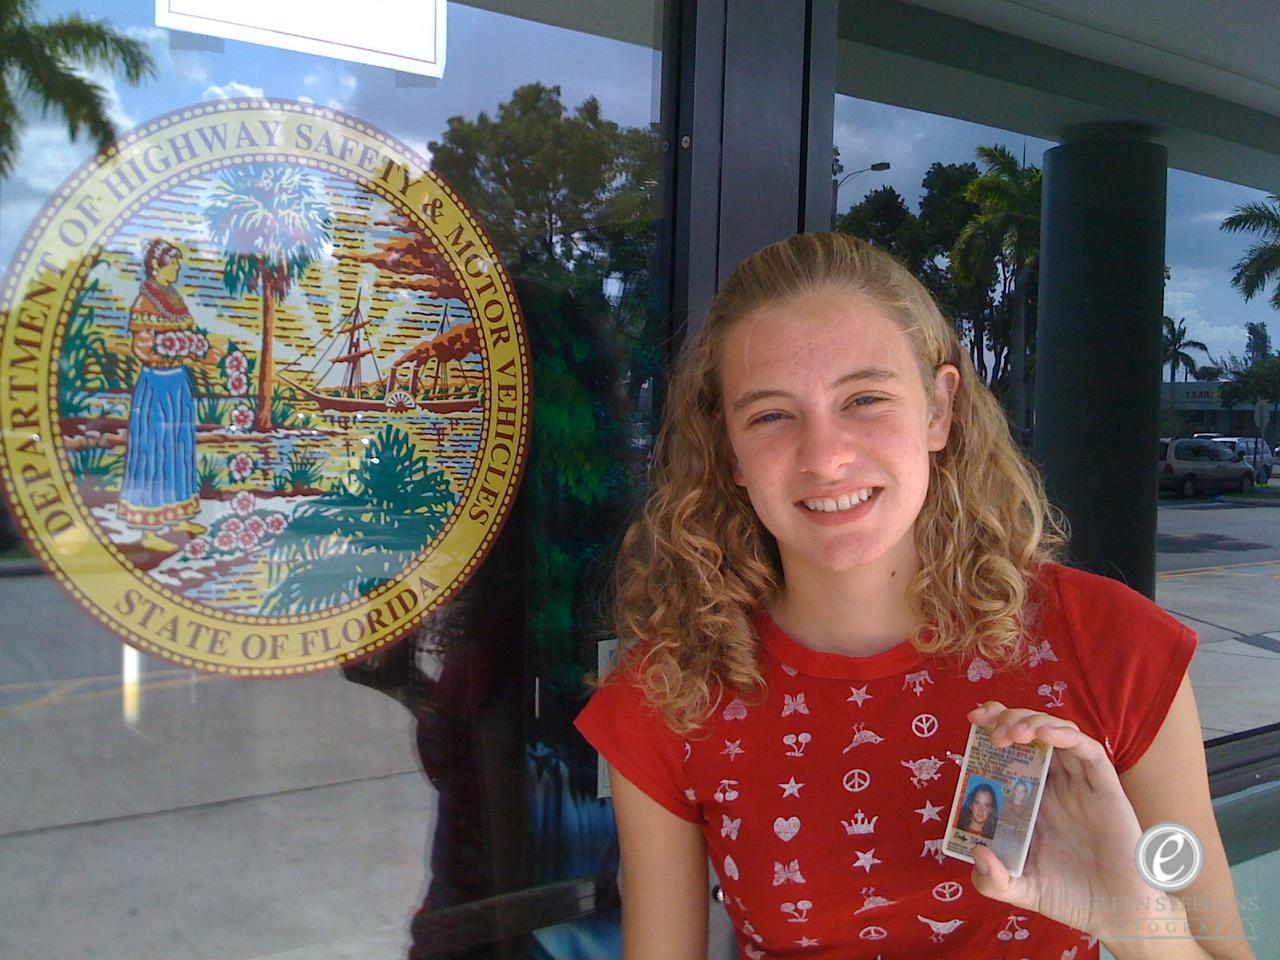 Emily got her permit